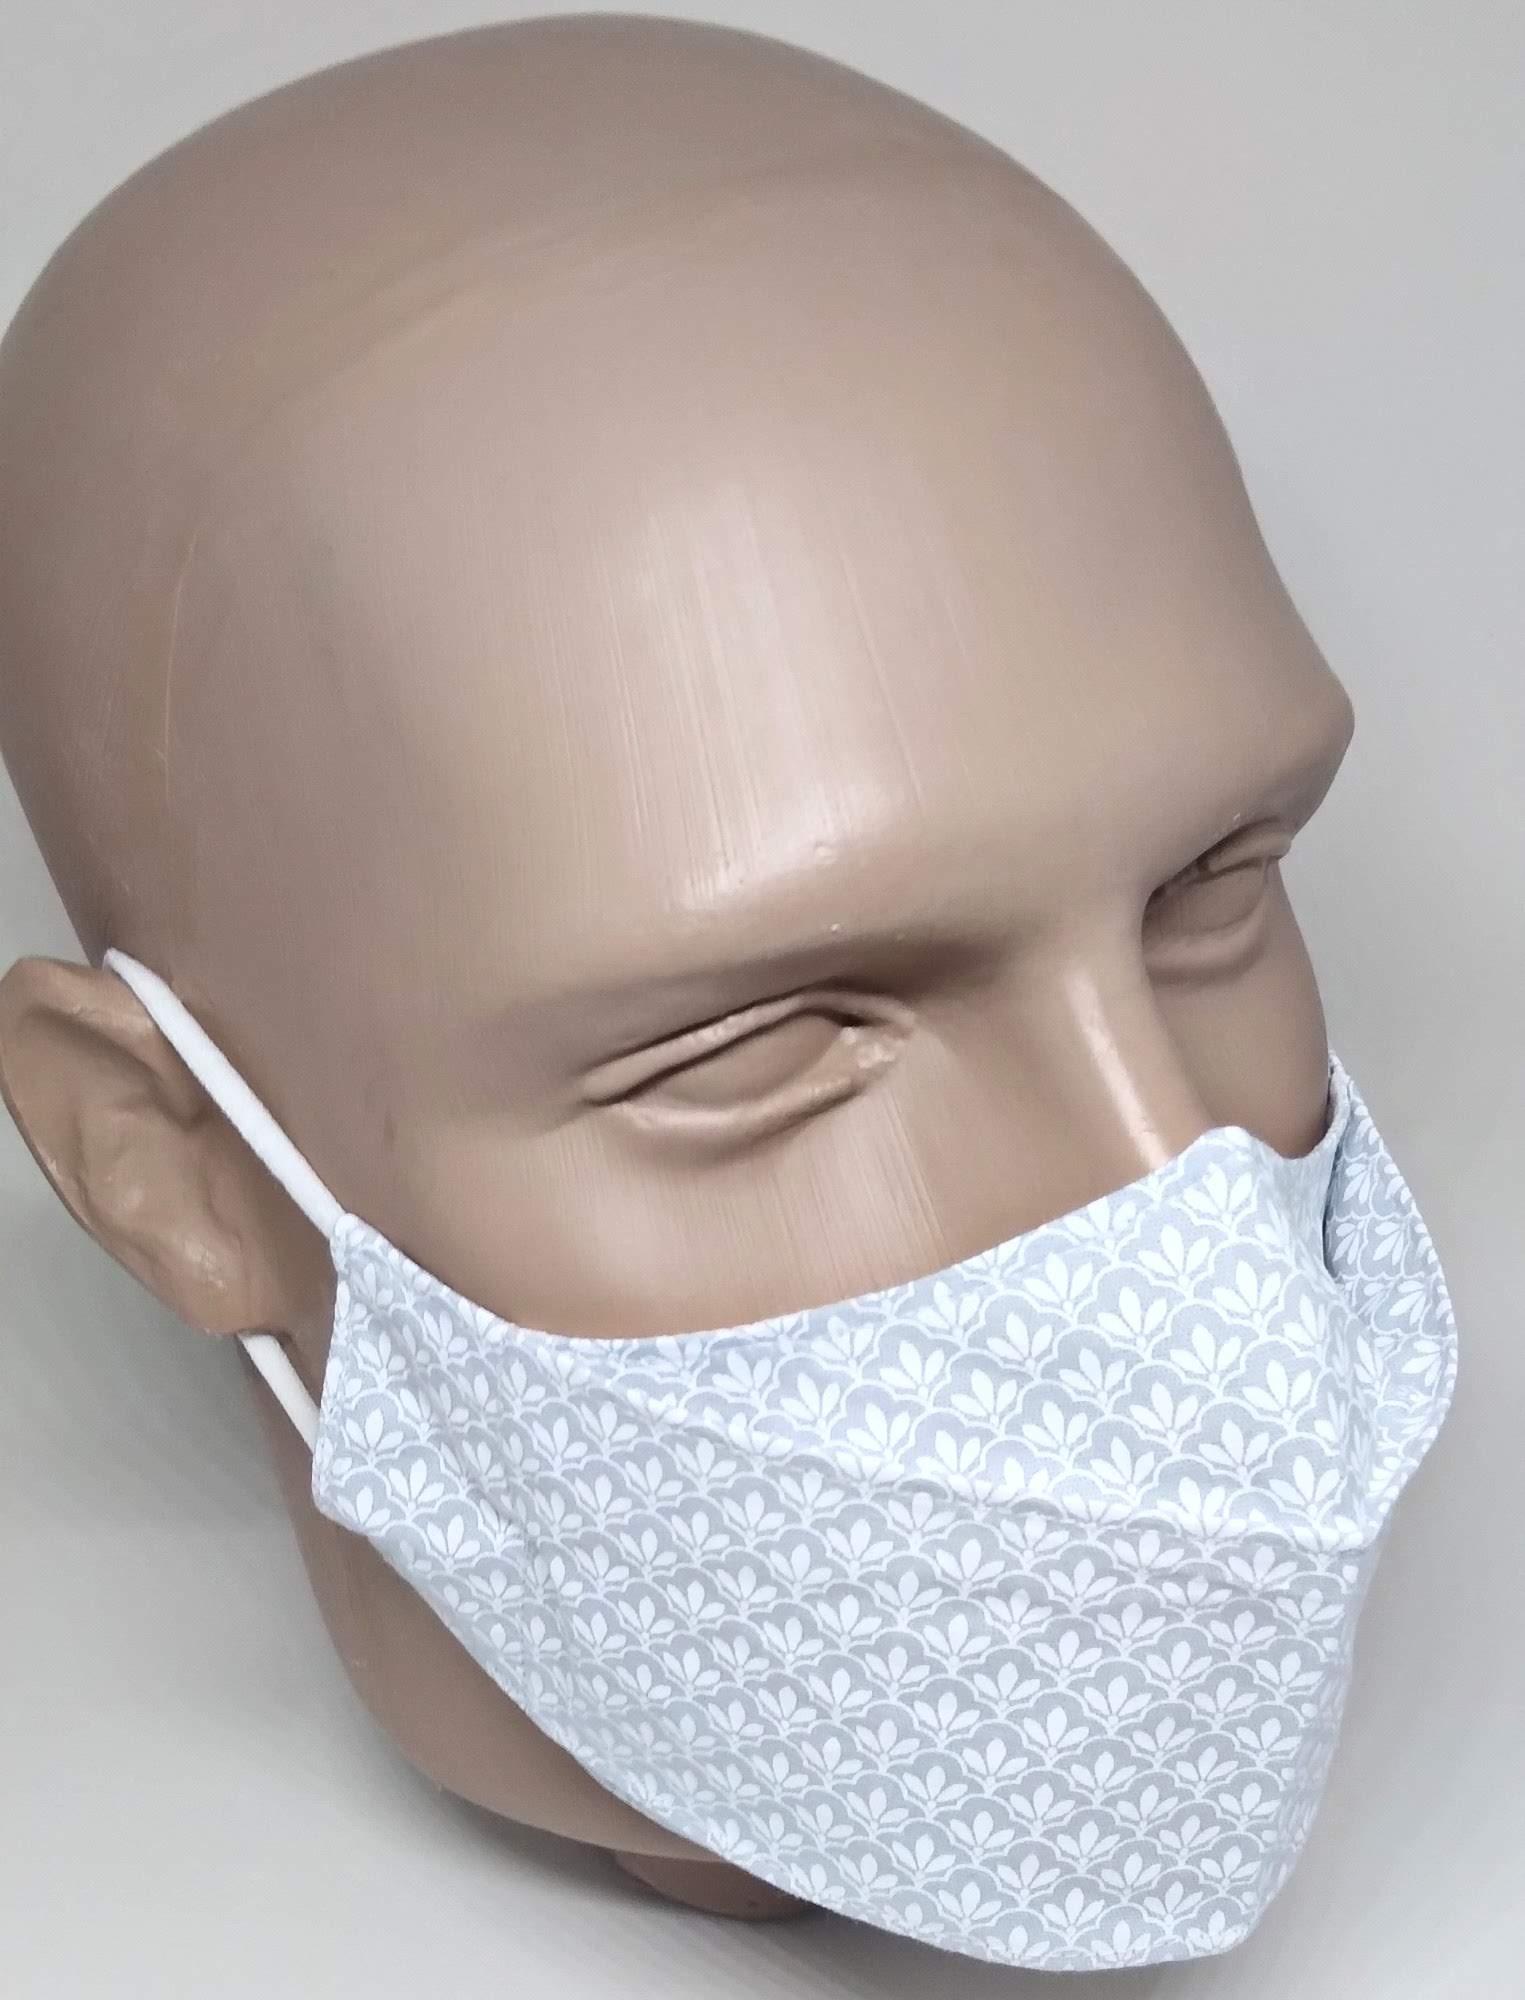 Máscara 3D Algodão Cinza Flor de Lírio Branco